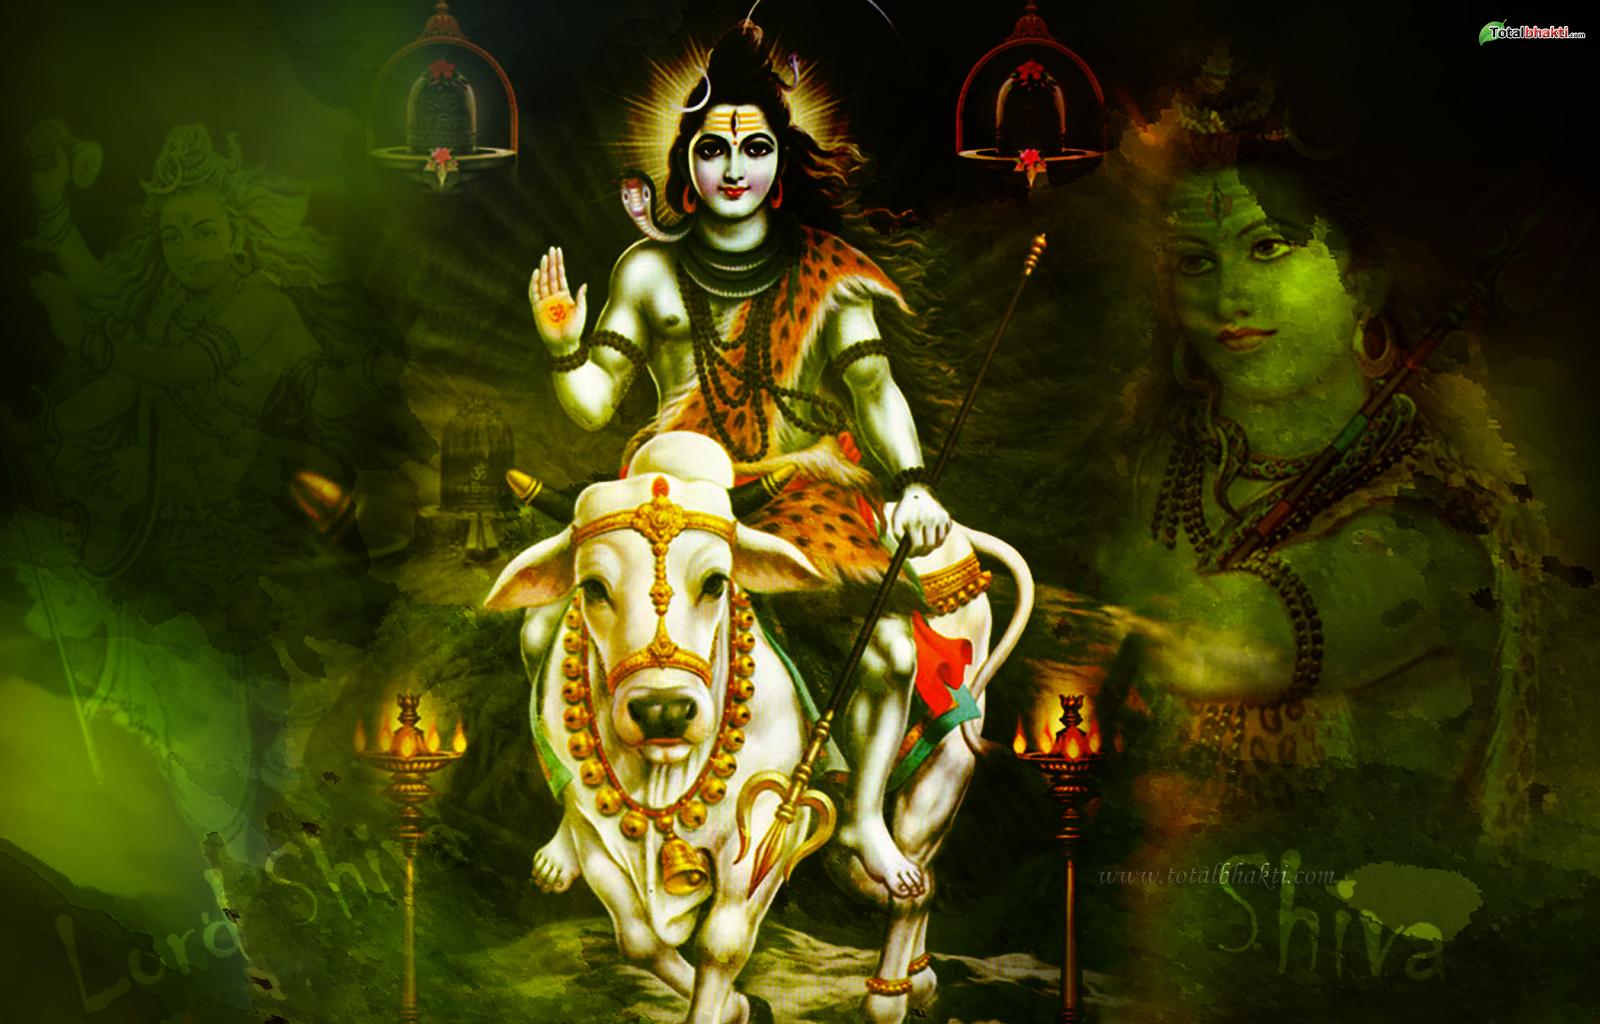 Lord Shiva Thumbgal